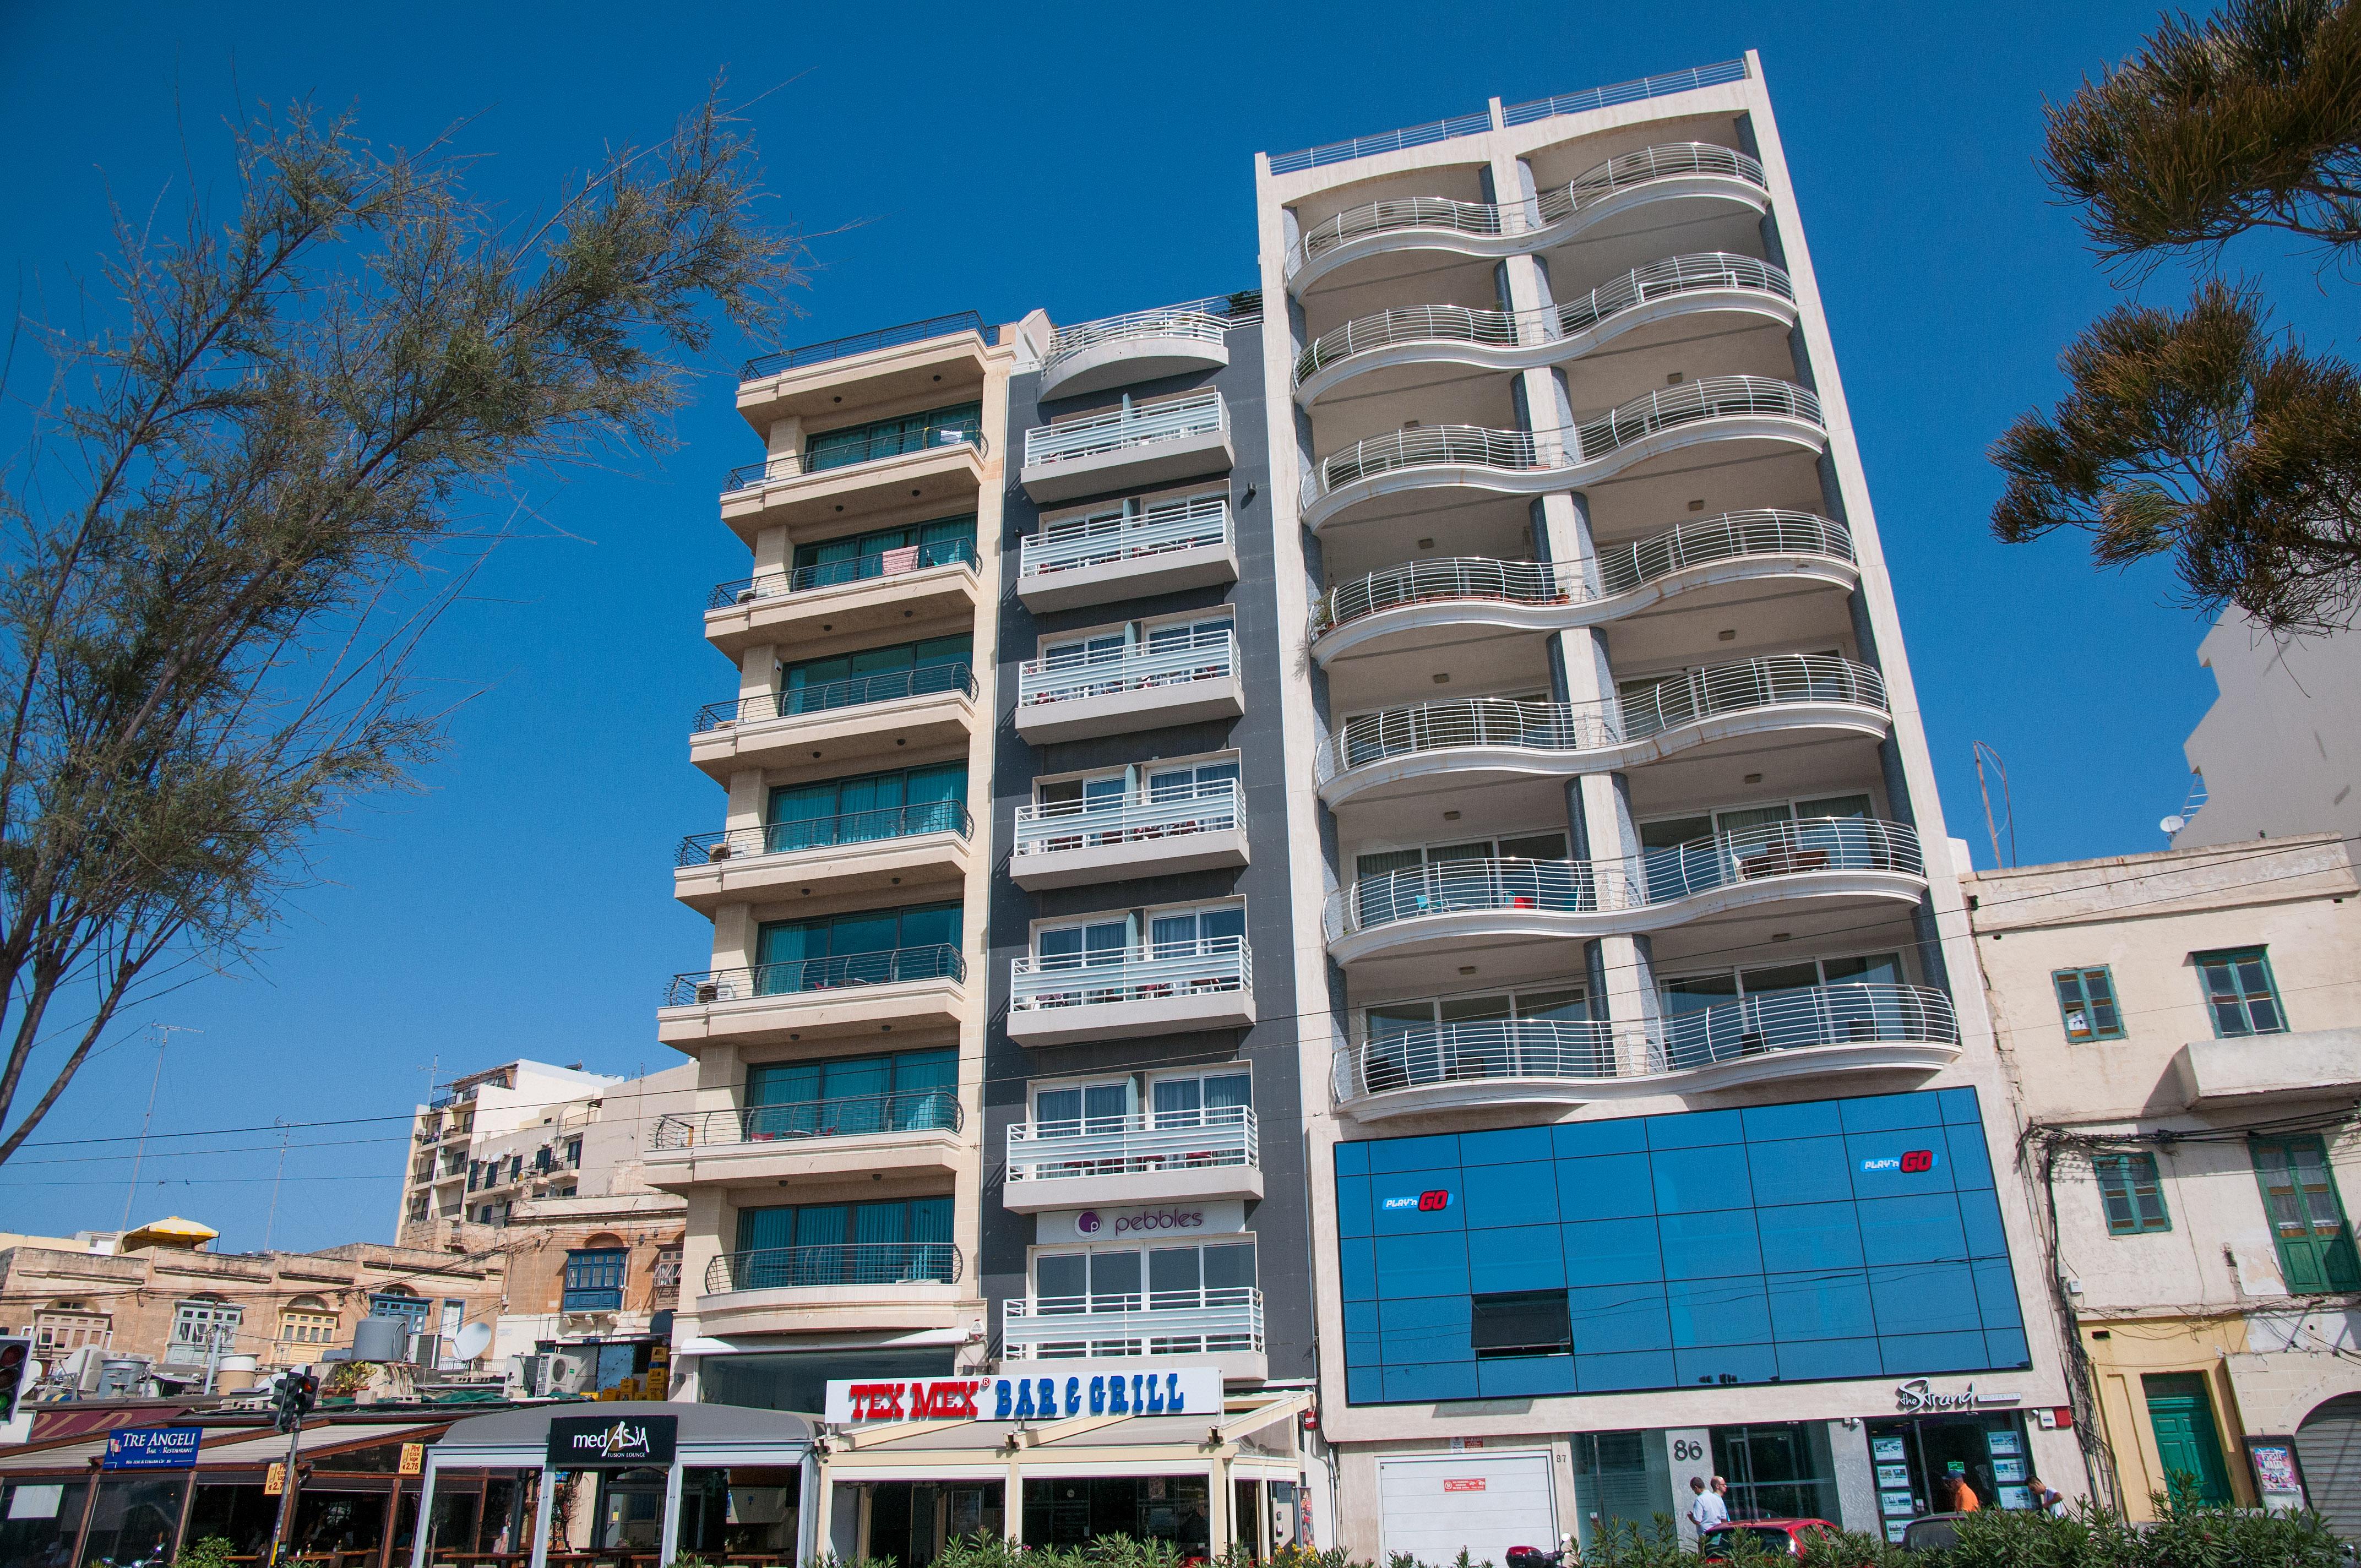 Hotels in Sliema